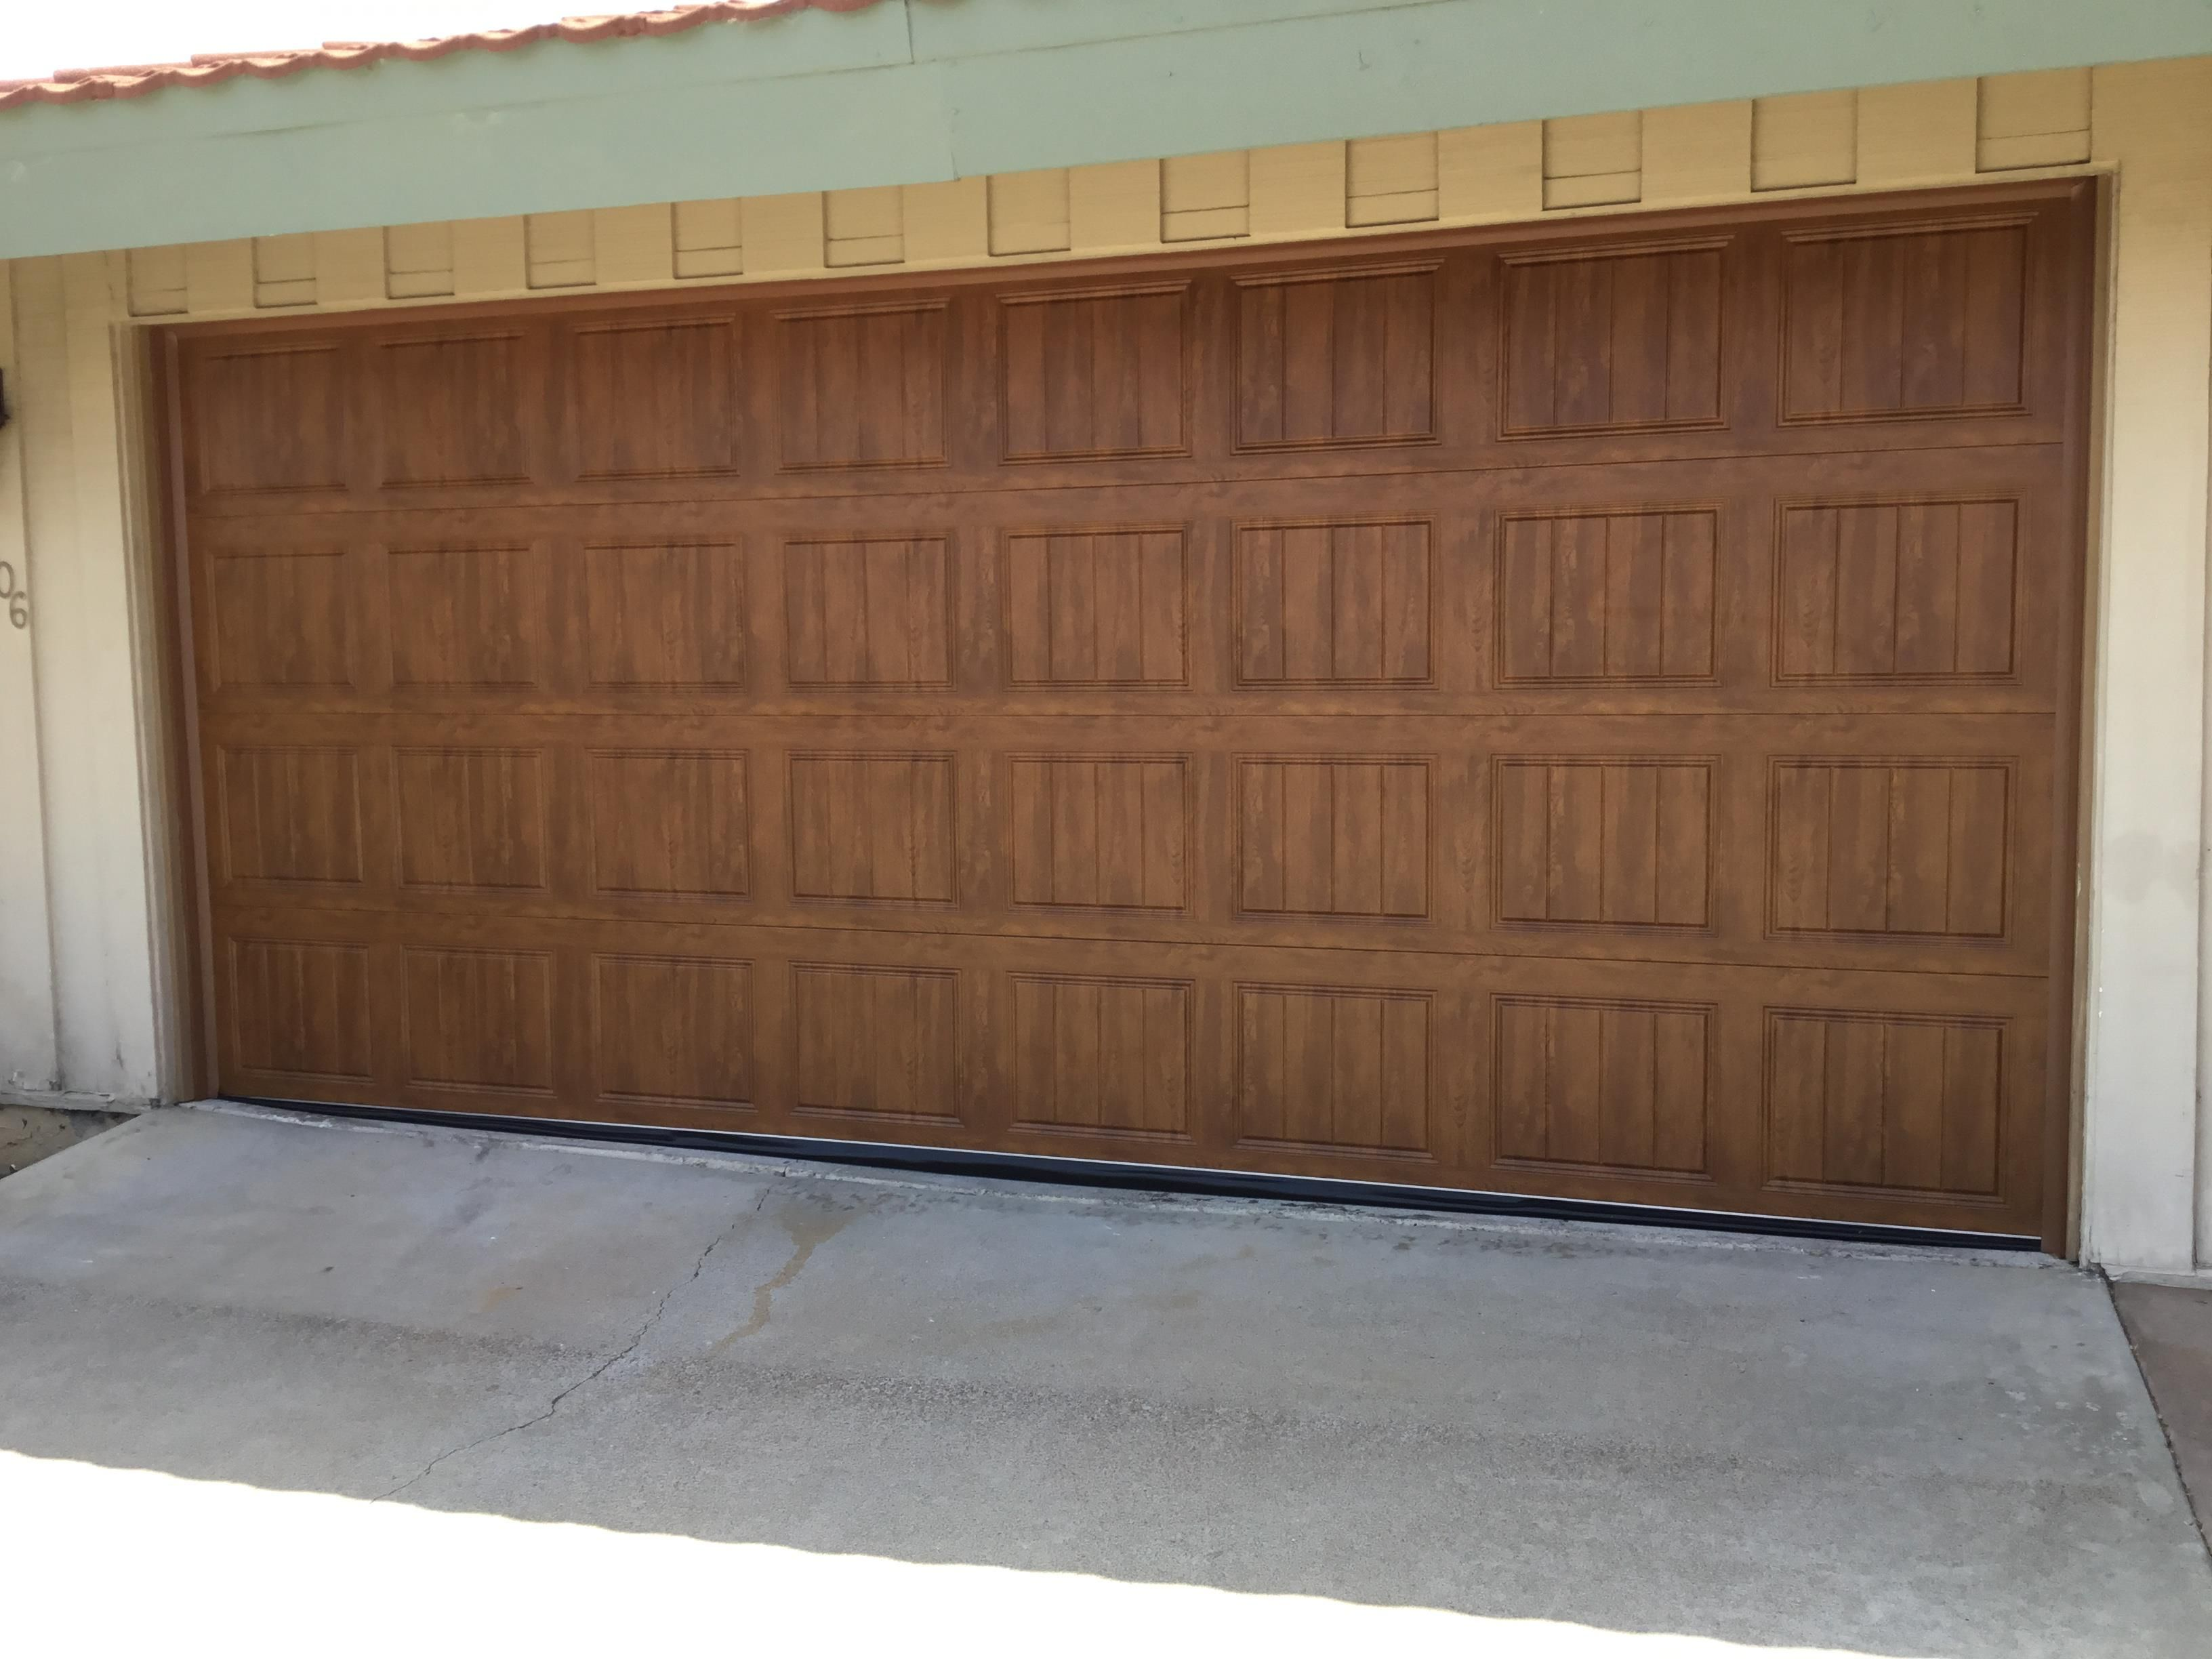 Beautiful Wood Door Install In San Diego California Door Installation Garage Doors Garage Door Repair